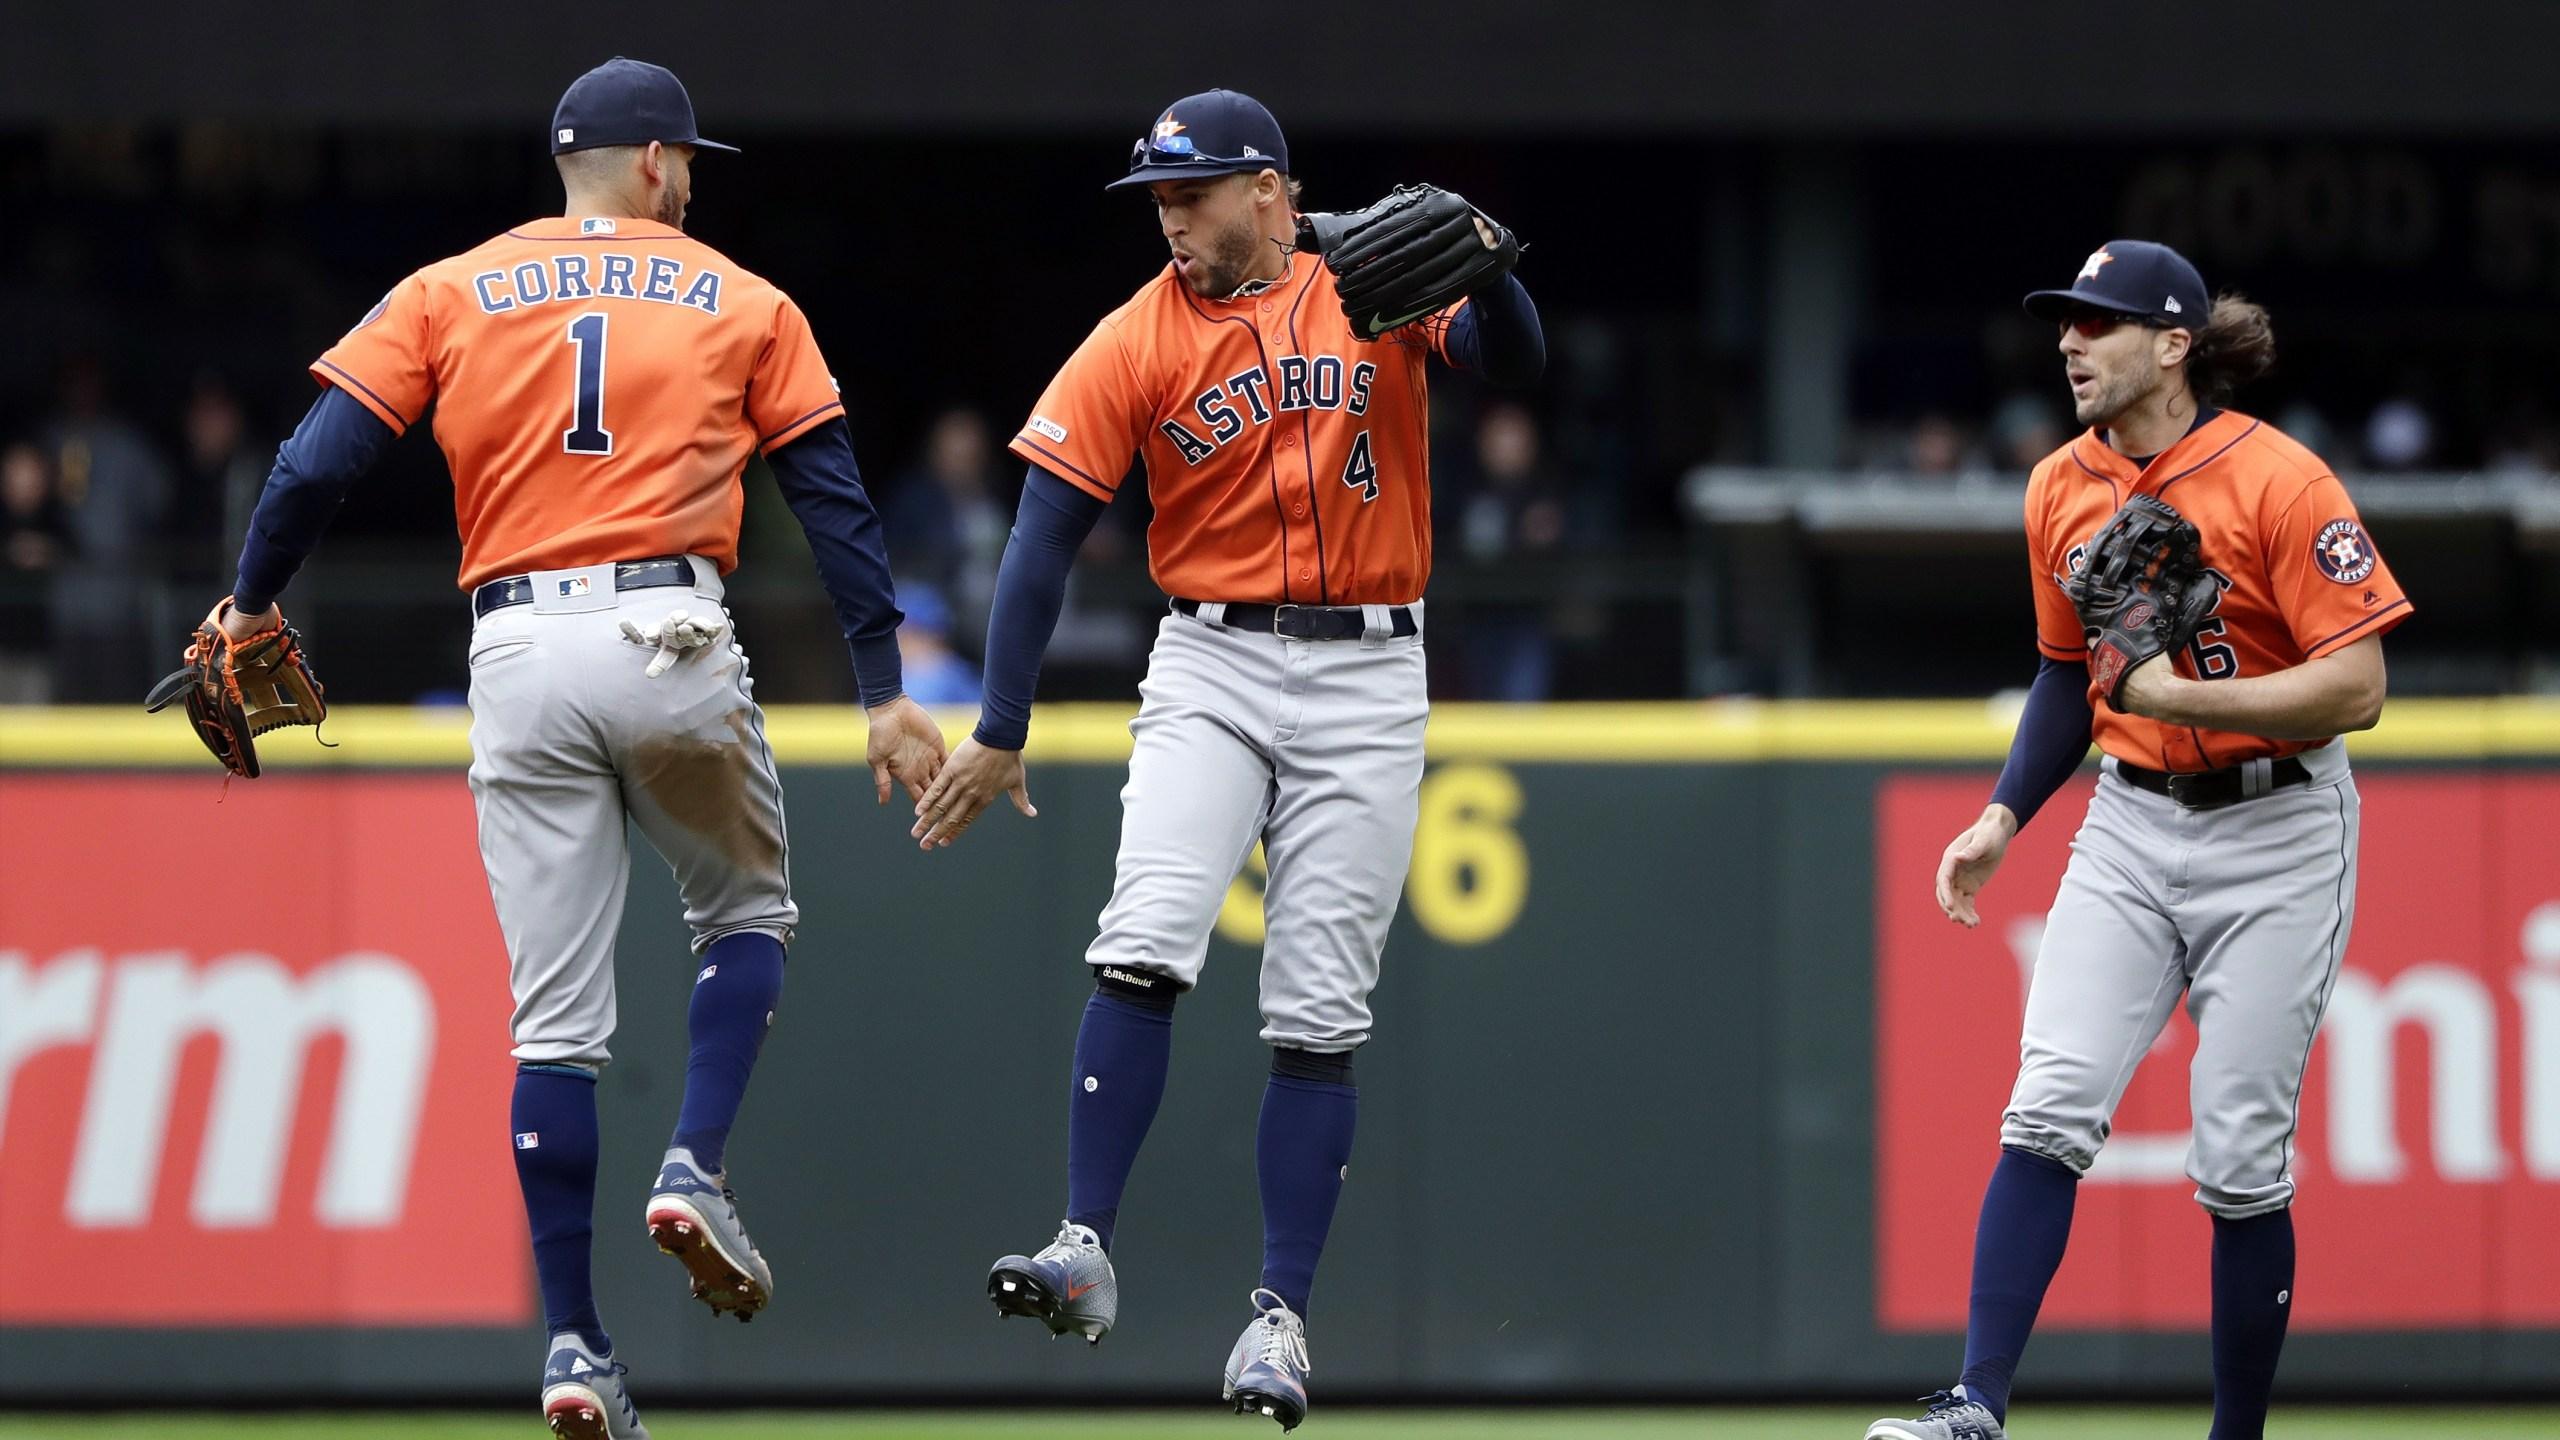 Astros win in Seattle April 2019